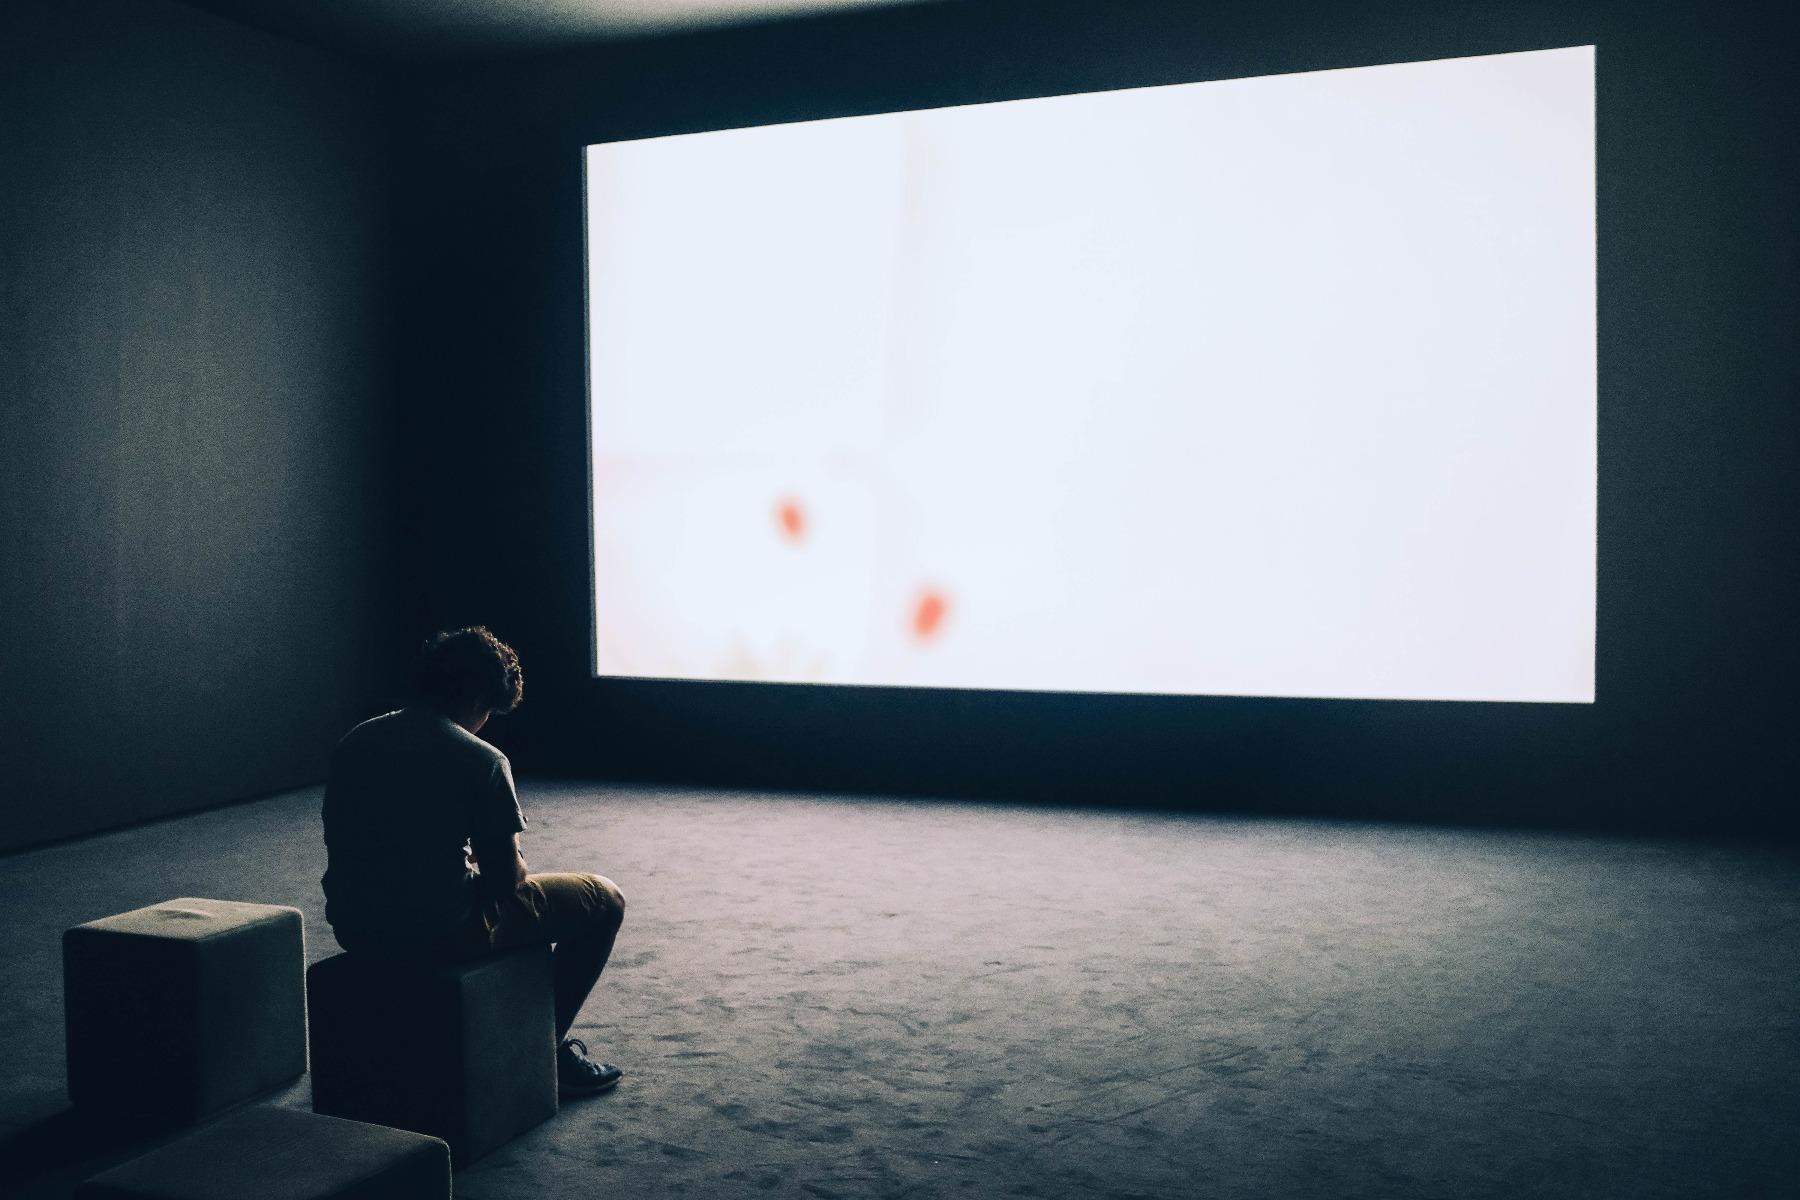 home theatre projector screen